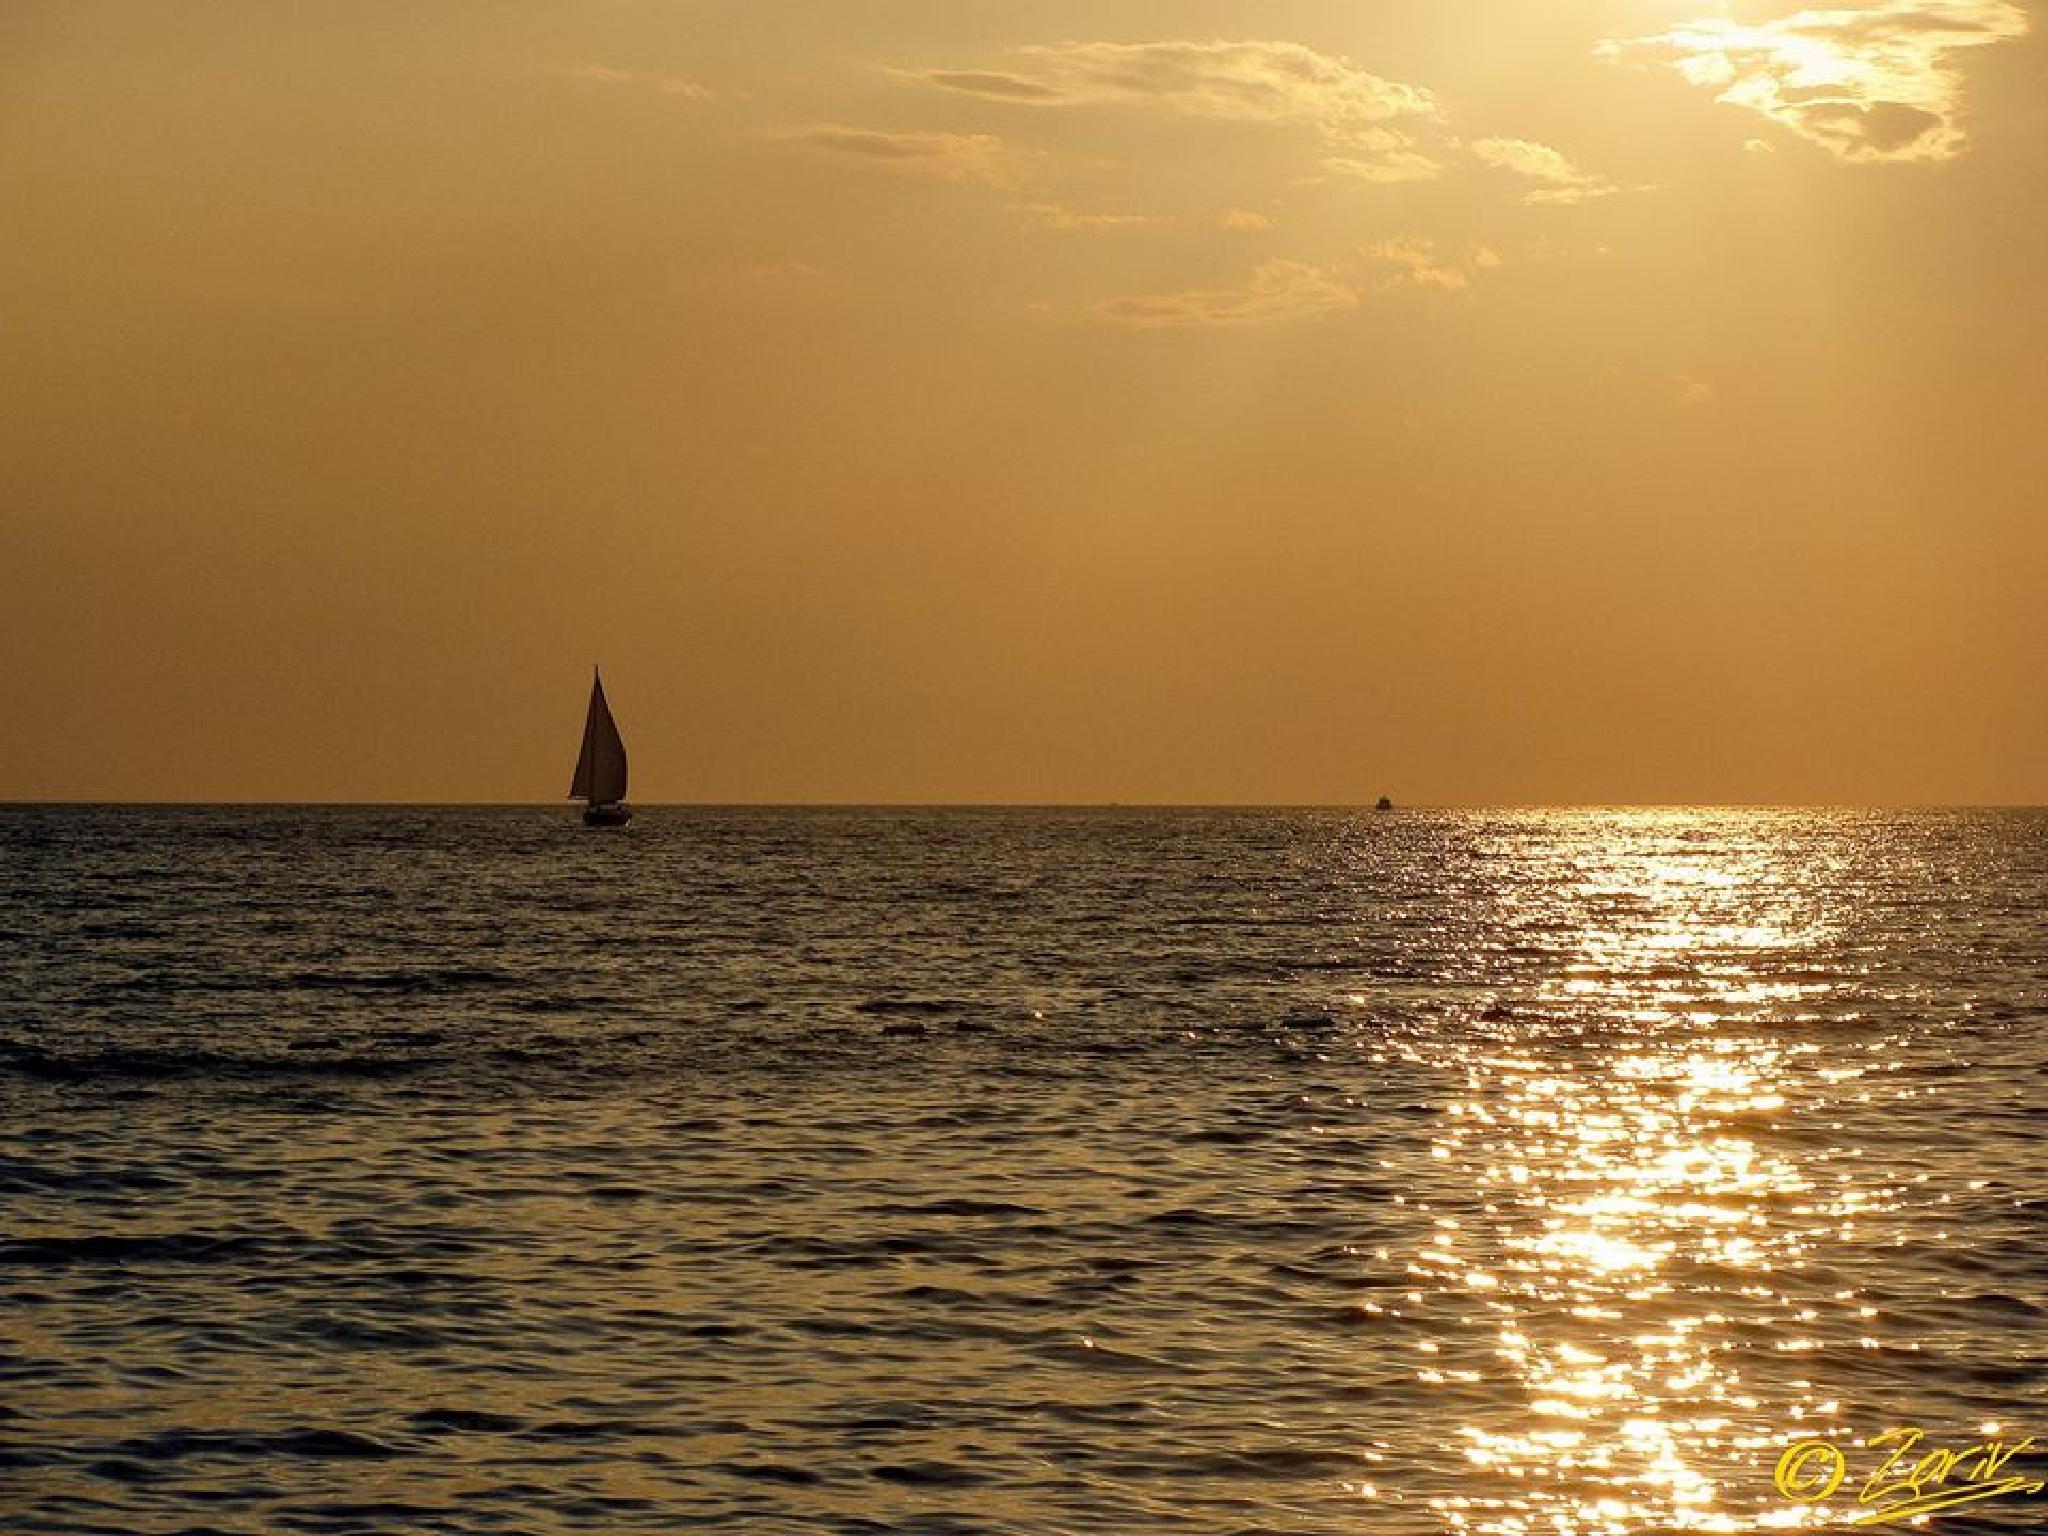 Sunset Paradise, somewhere in Mid Dalmatia (Croatia) by zoriv